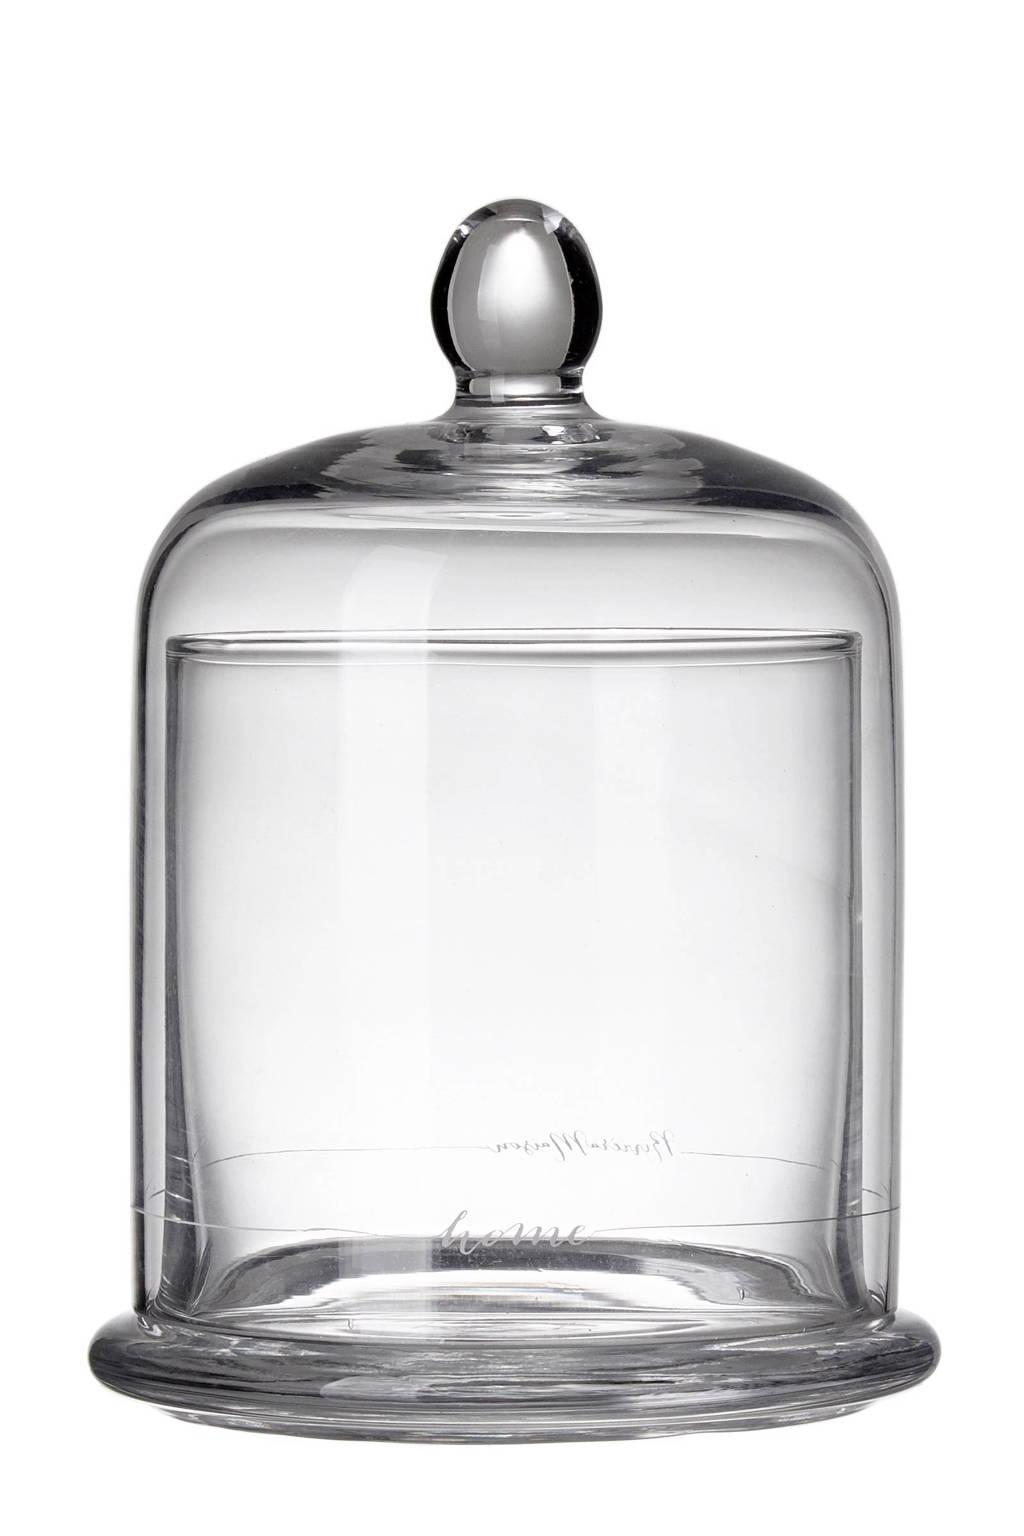 Beste Riviera Maison 'RM Home Classic' stolp | wehkamp GV-94